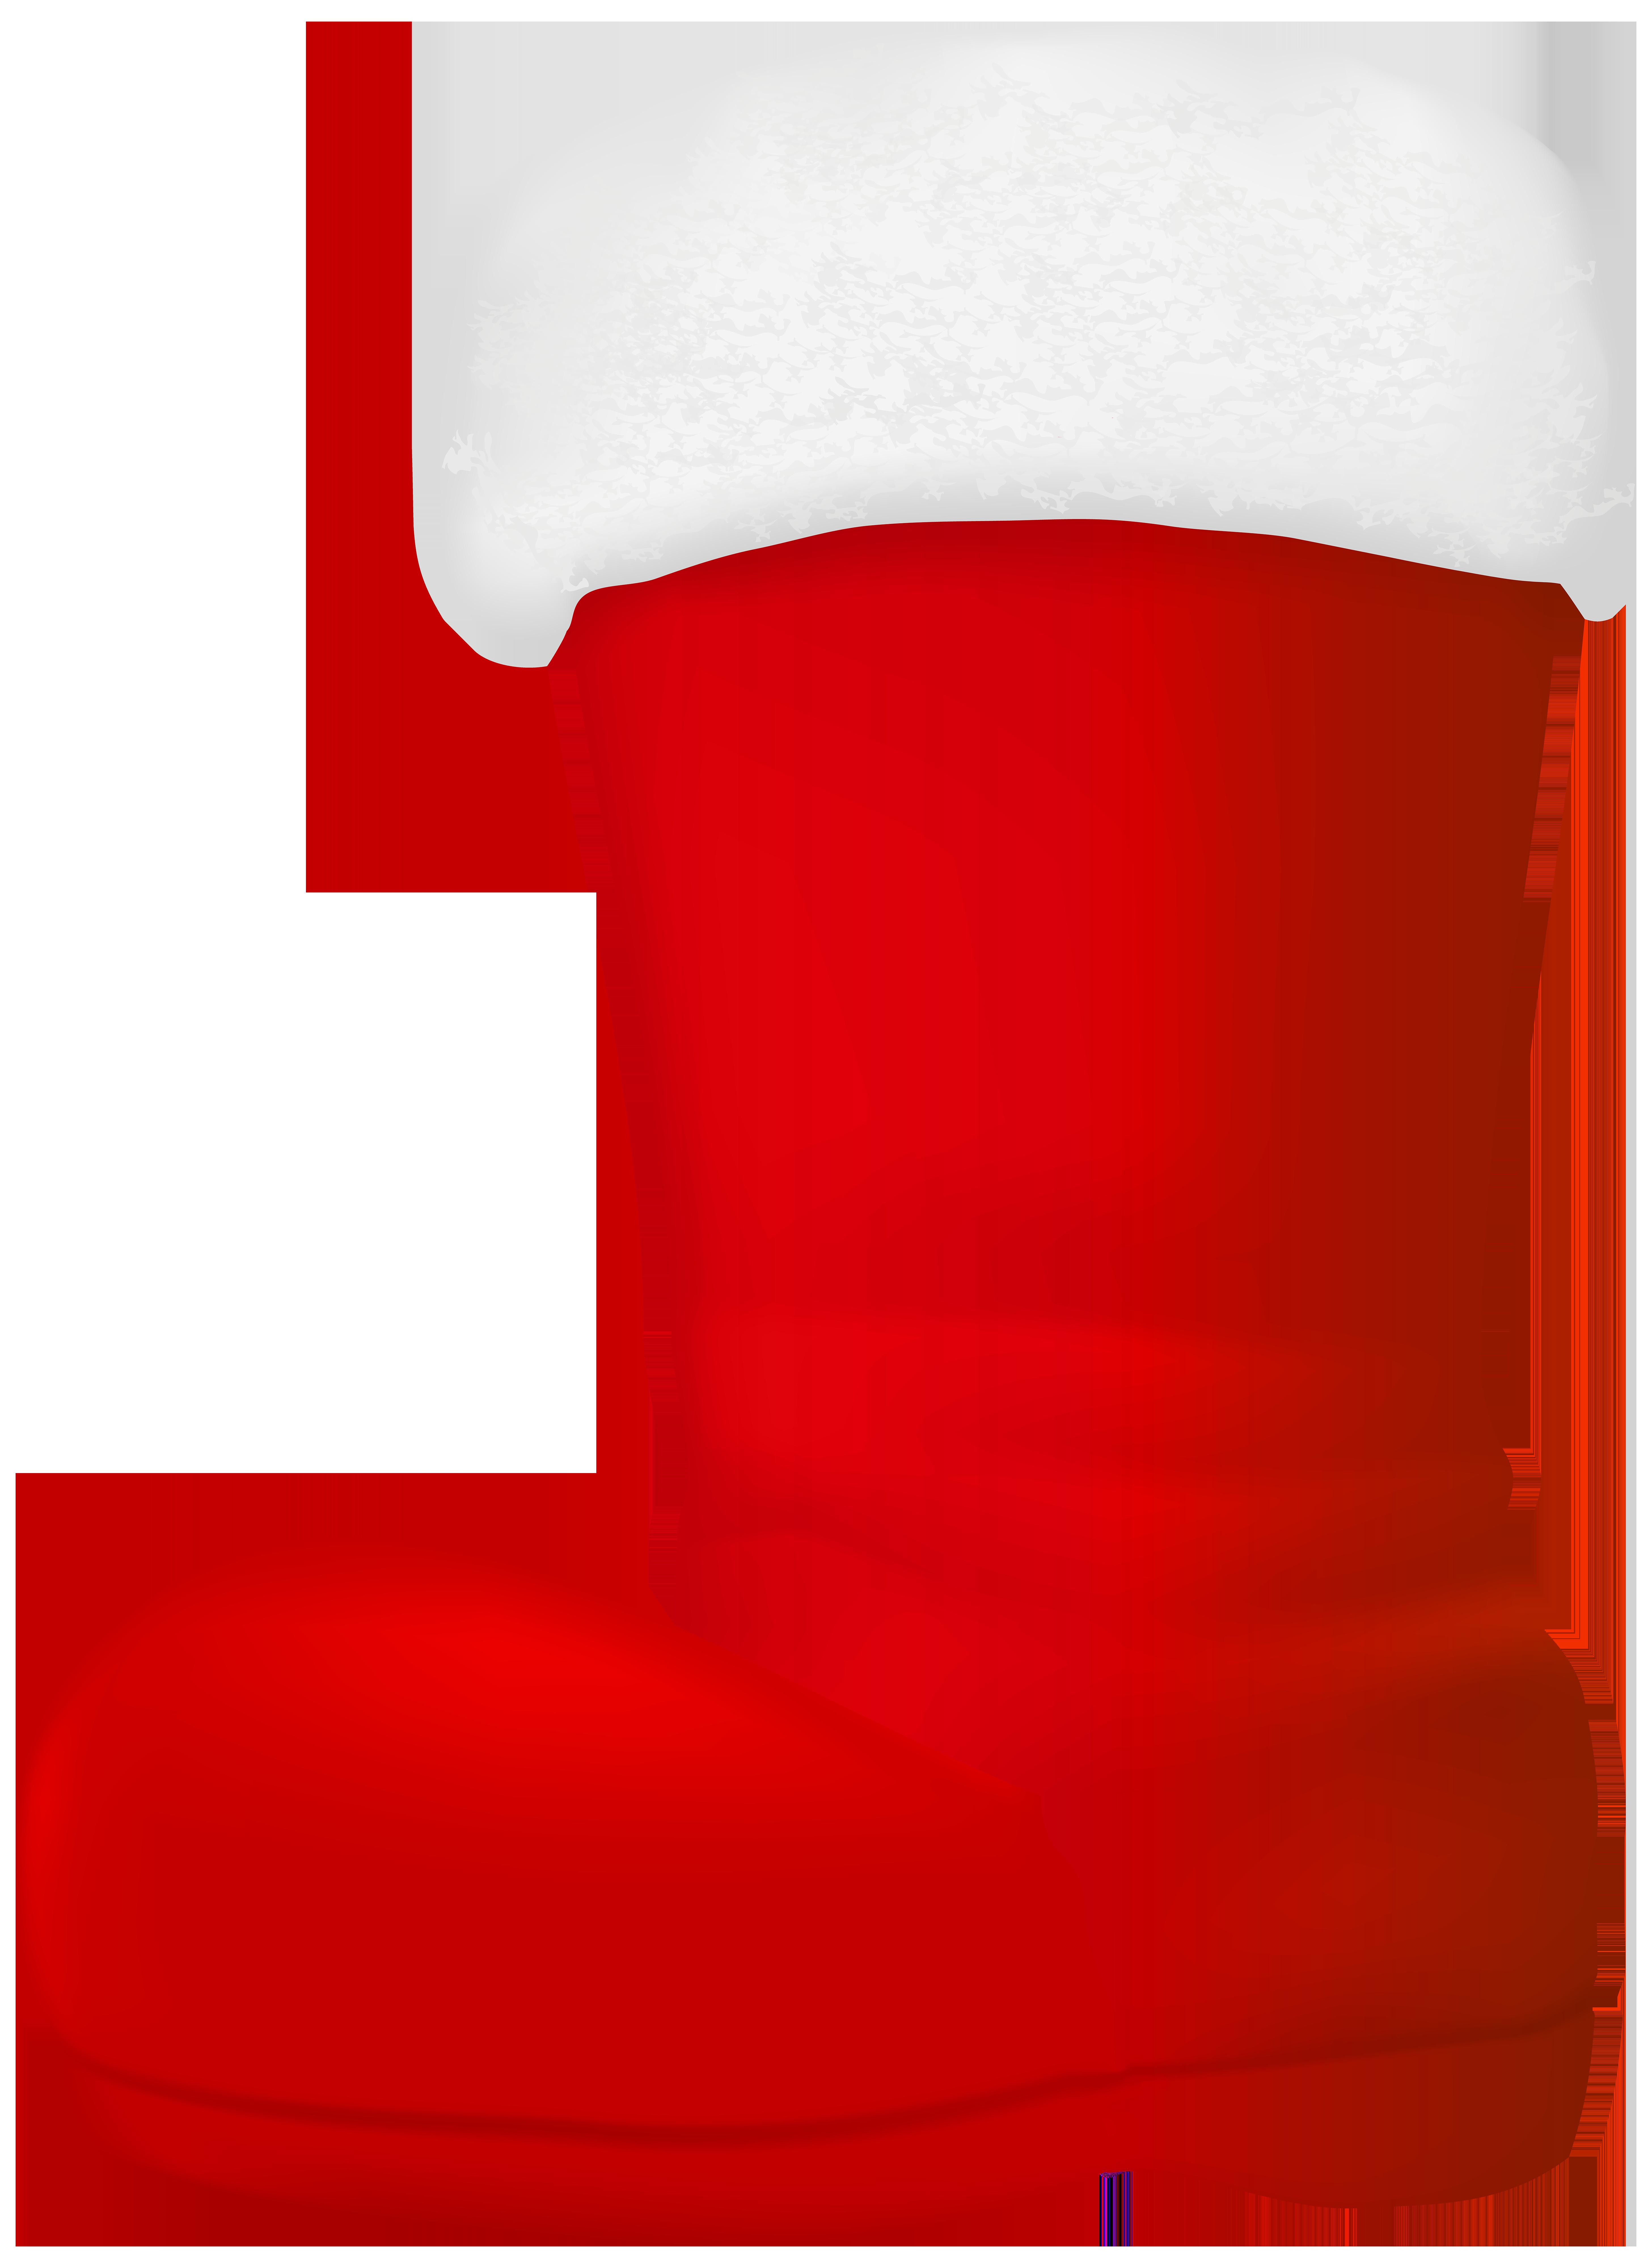 Santa Claus Boot Transparent Clip Art Image.